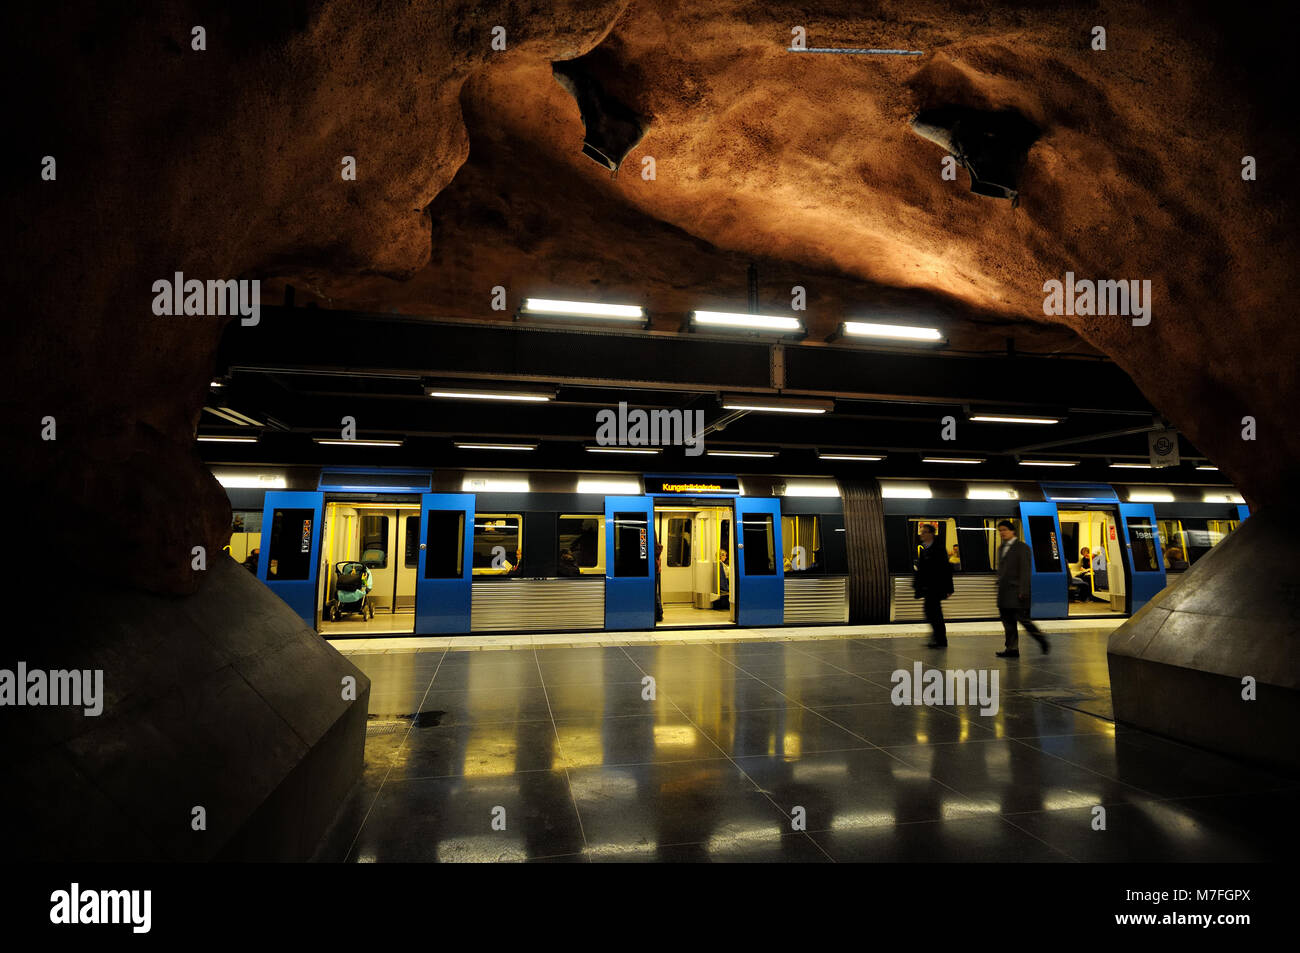 Rådhuset metro station, Stockholm, Sweden Stock Photo